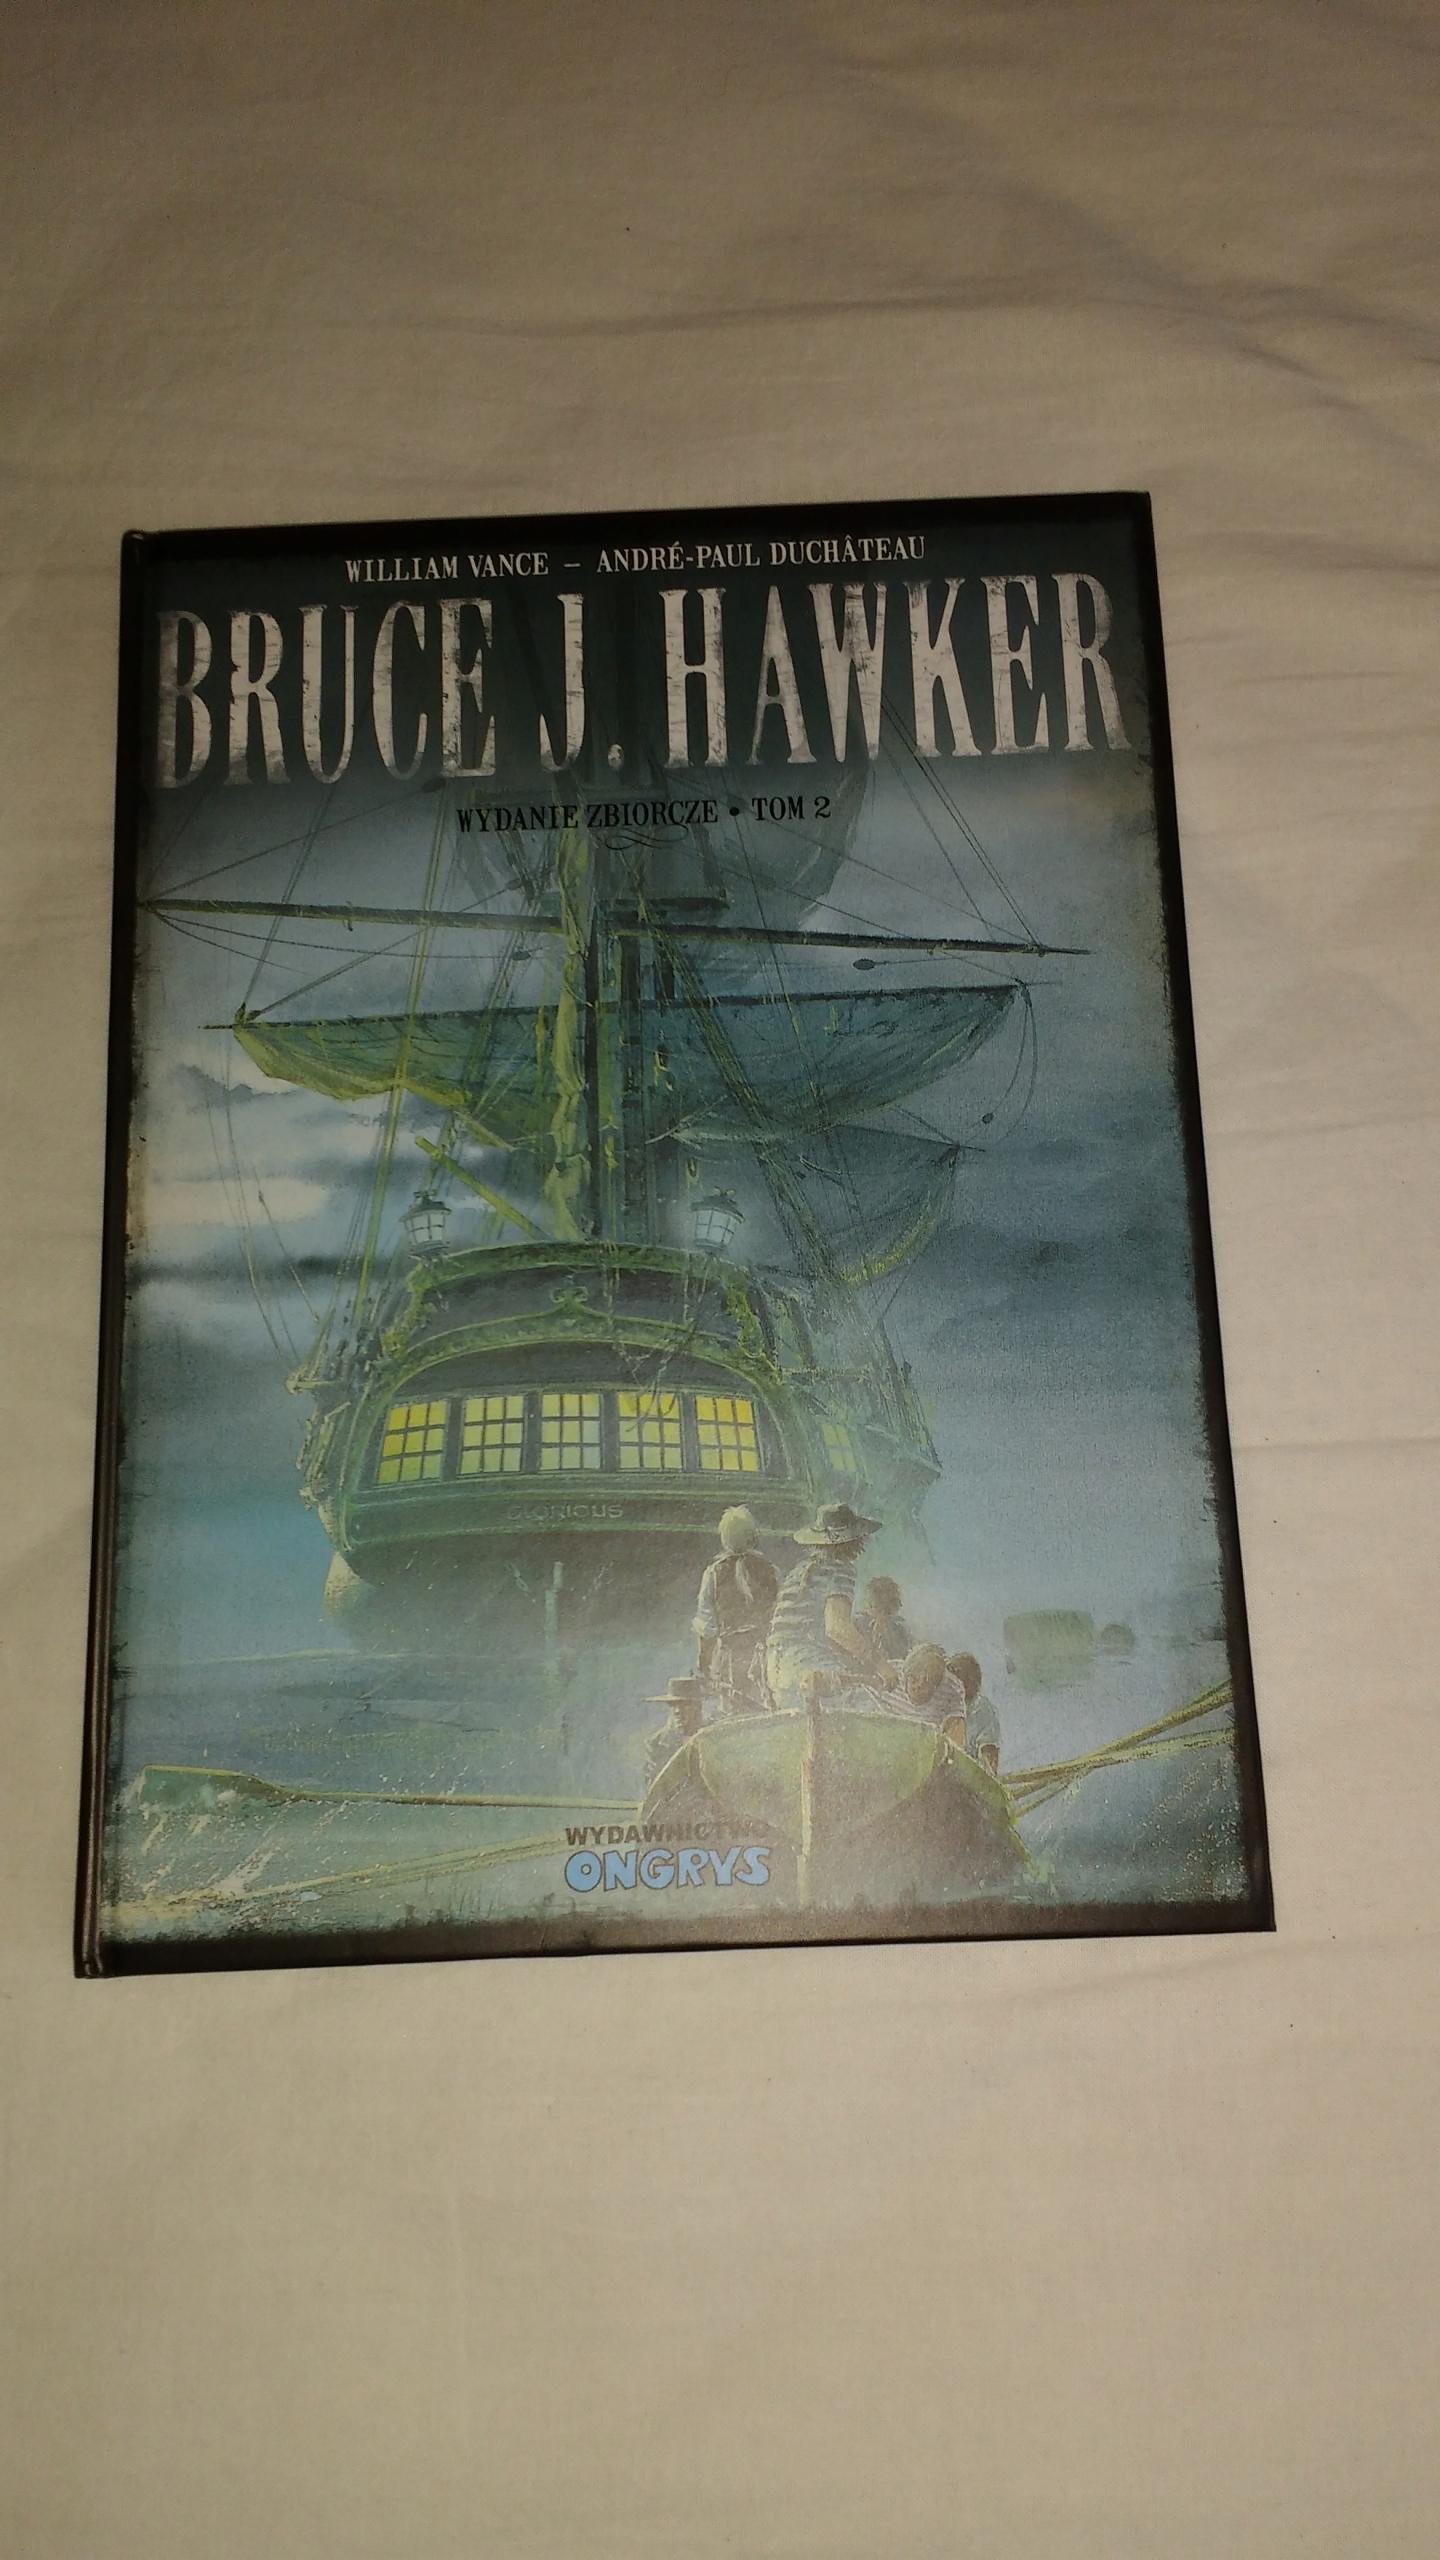 Bruce J Hawker wydanie zbiorcze 2 Vance Duchateau